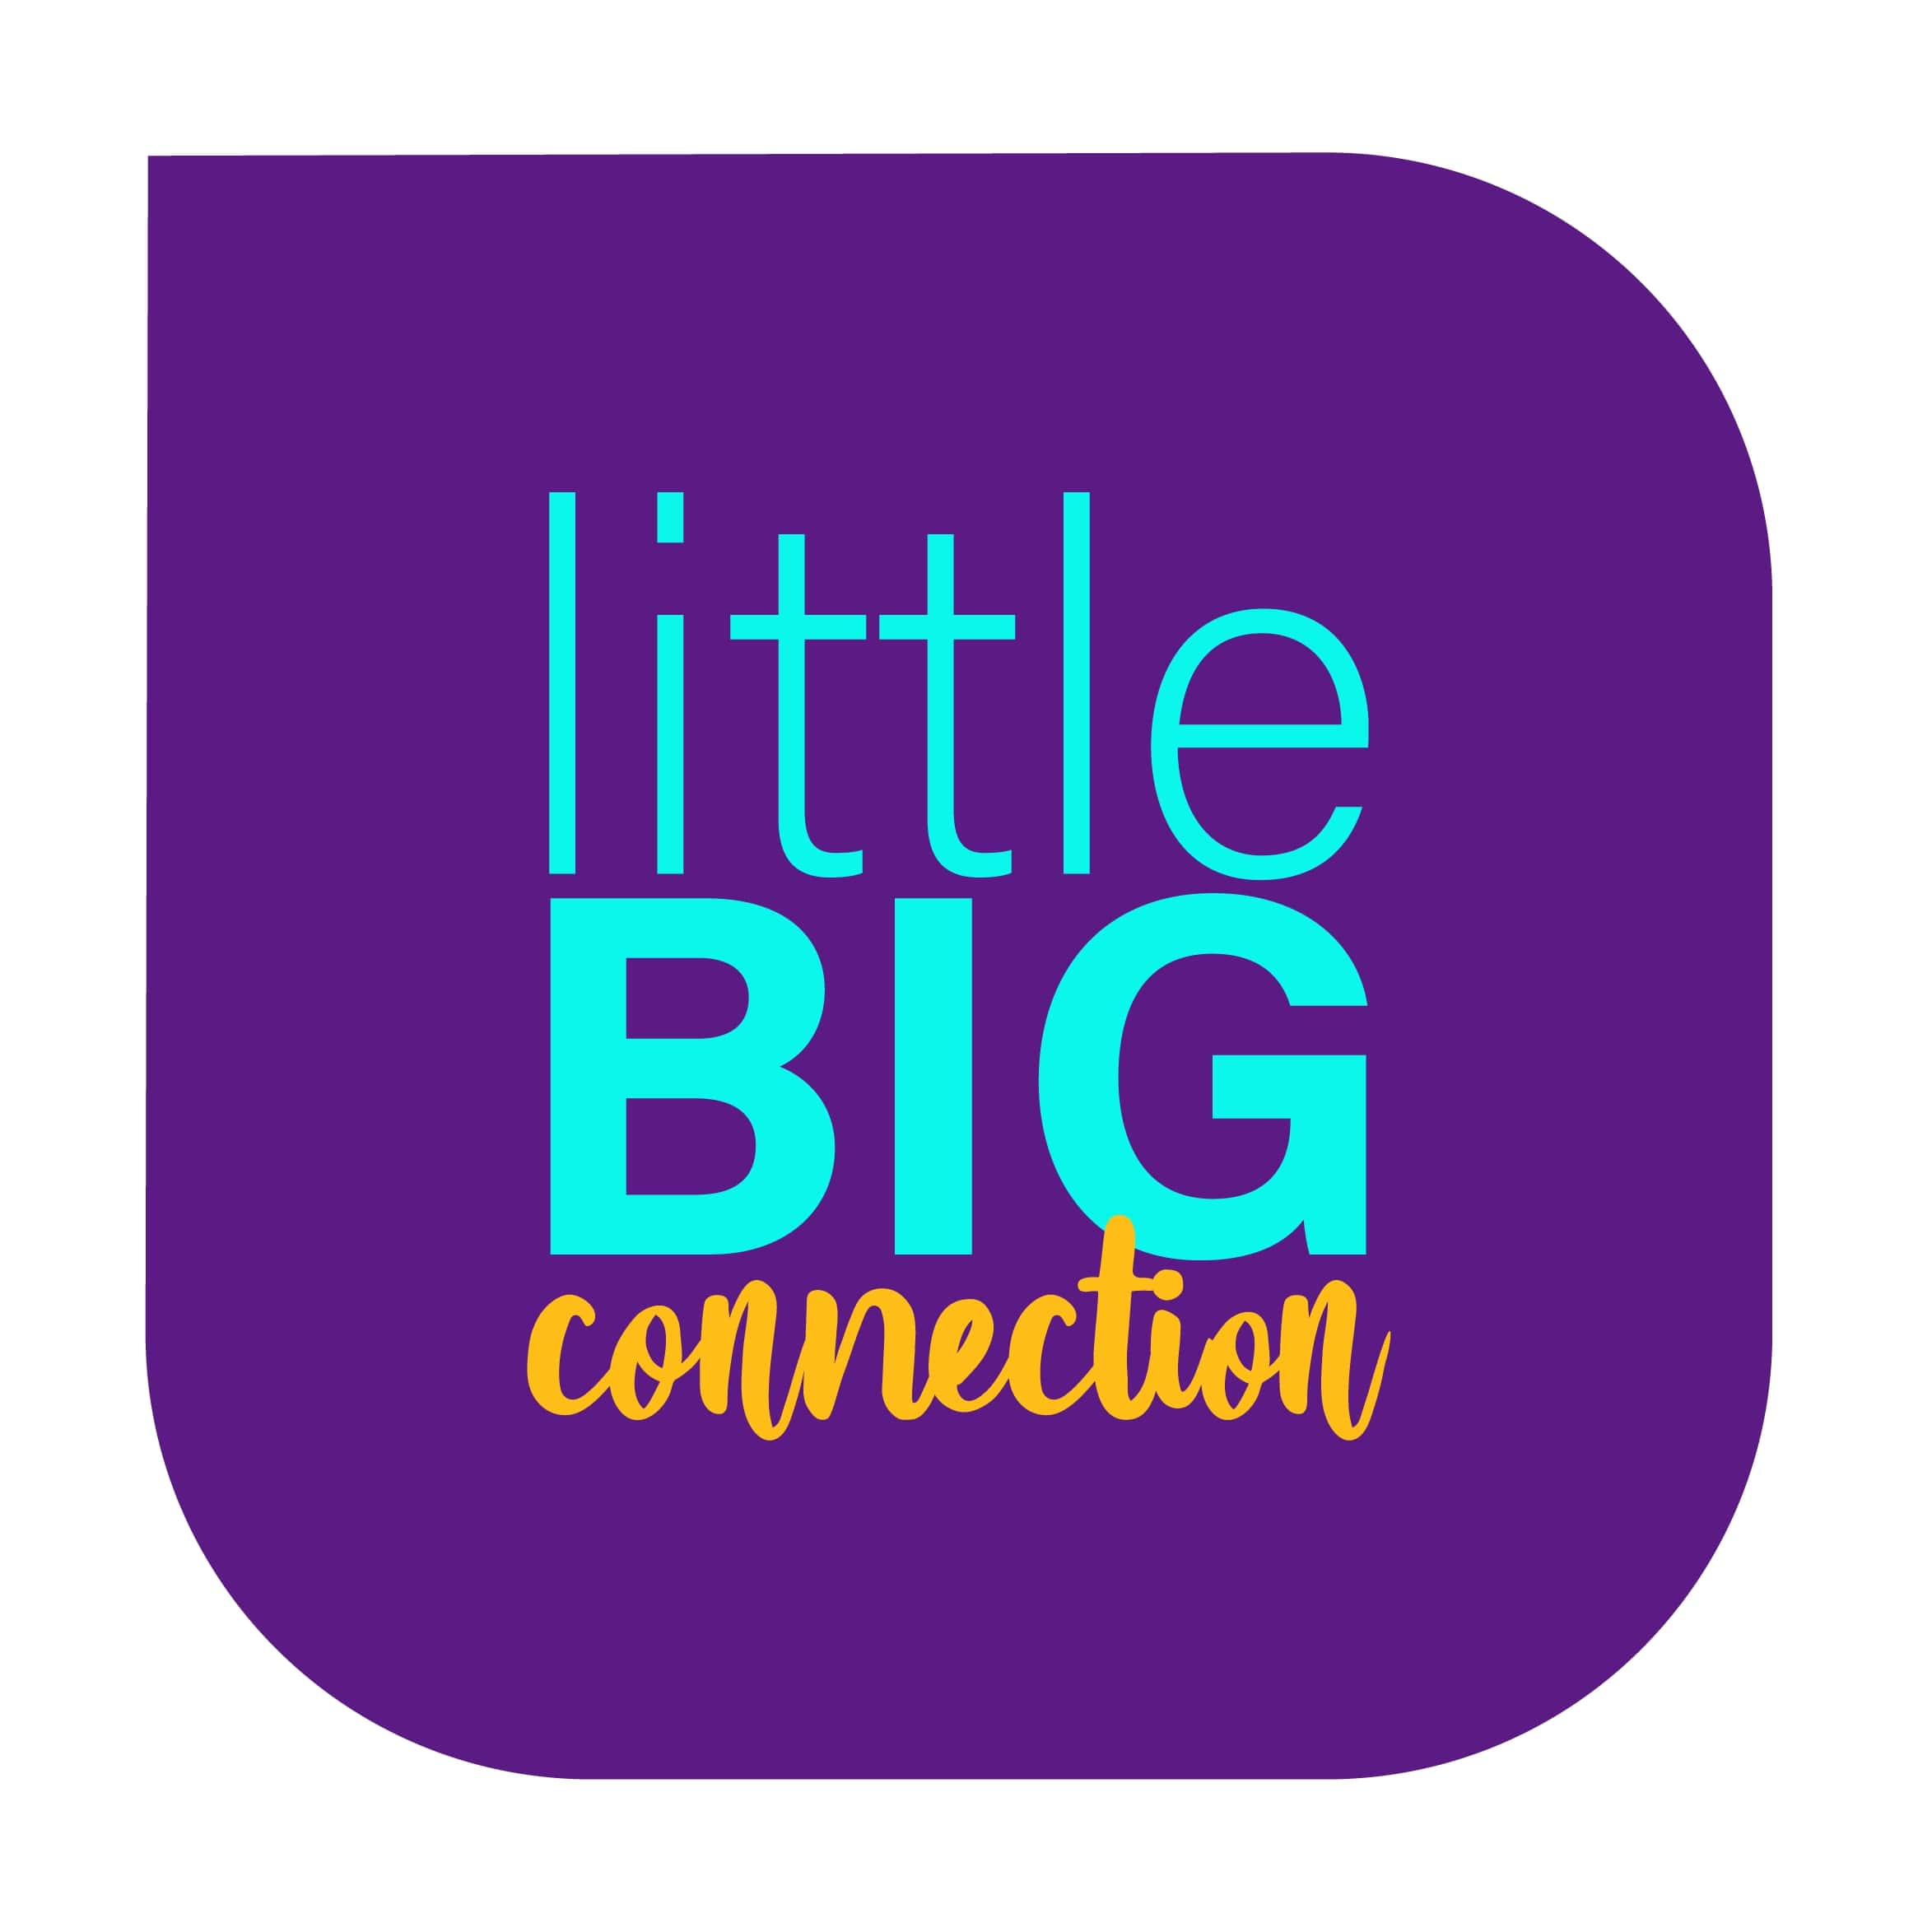 LittleBIG Connection